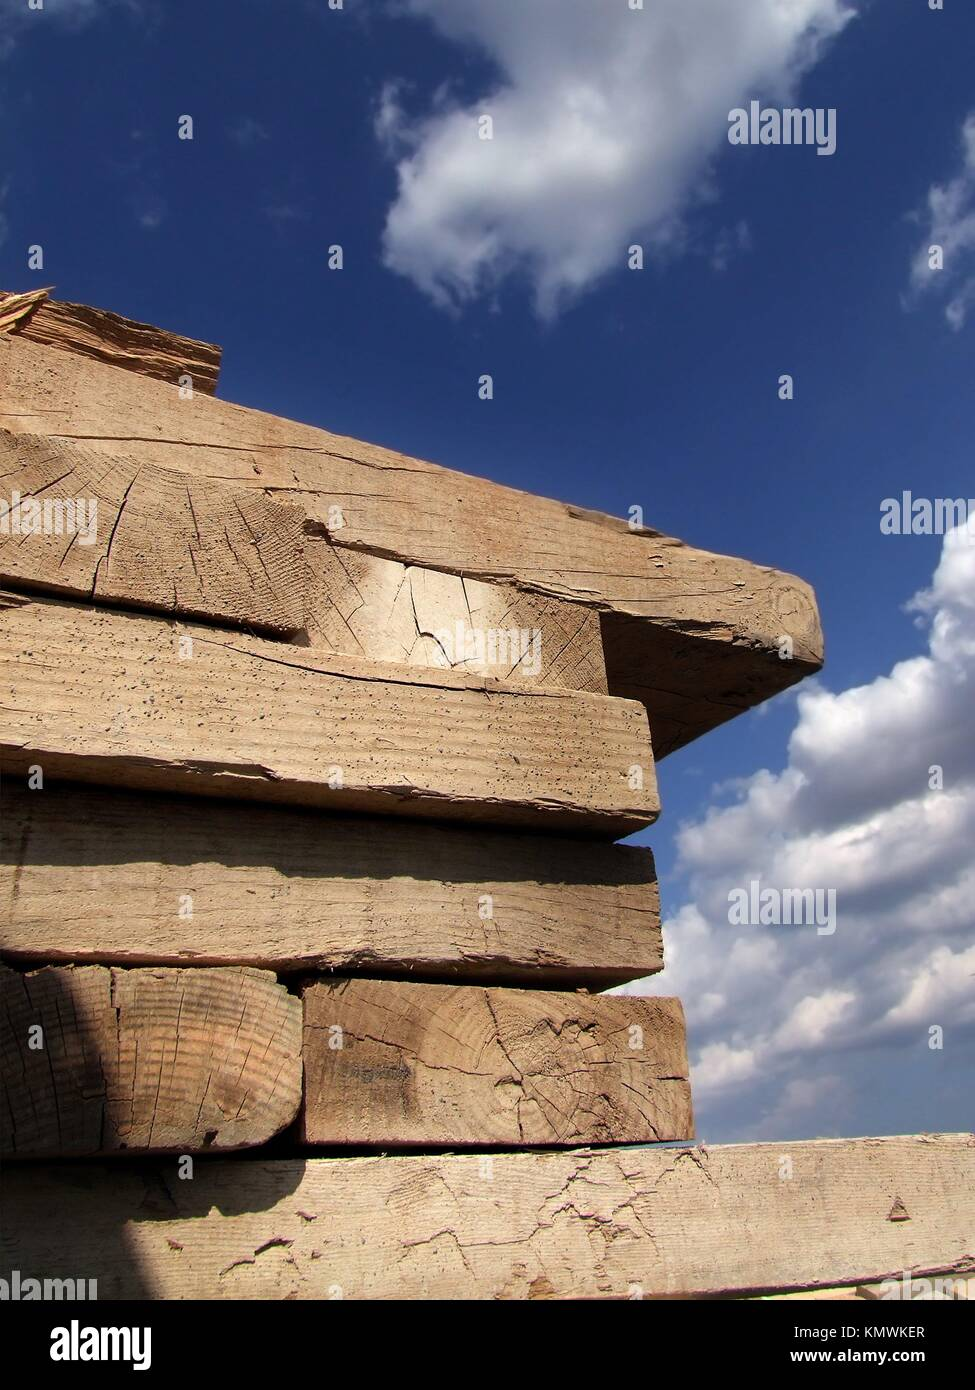 Materiales de construcción Stockbild